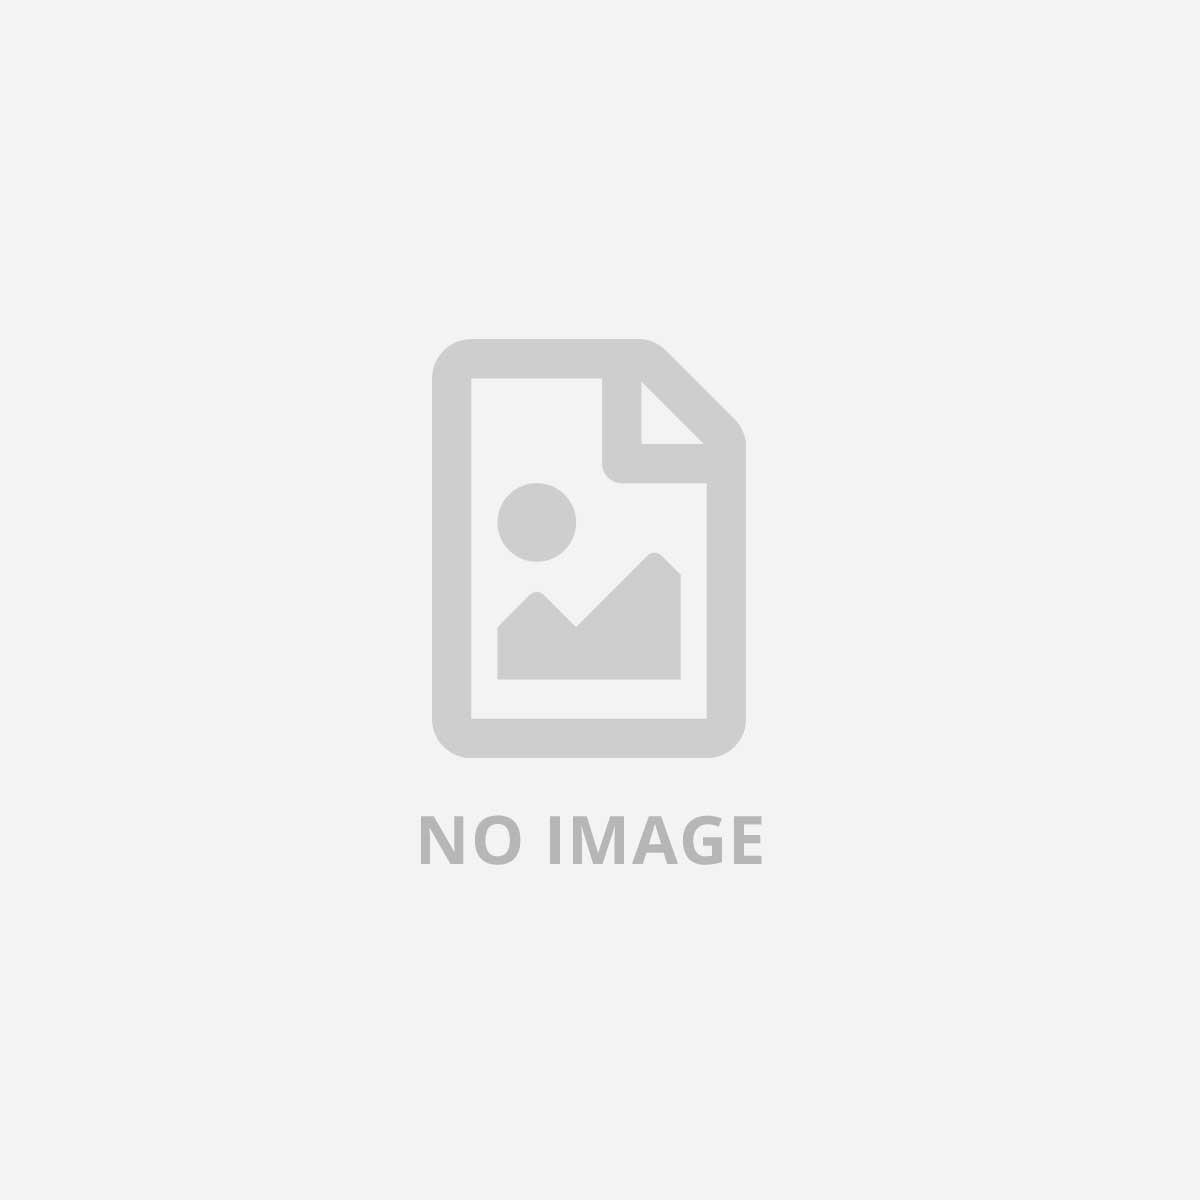 EXTREME NETWORKS BKT AP650  AP650X  OR AP630